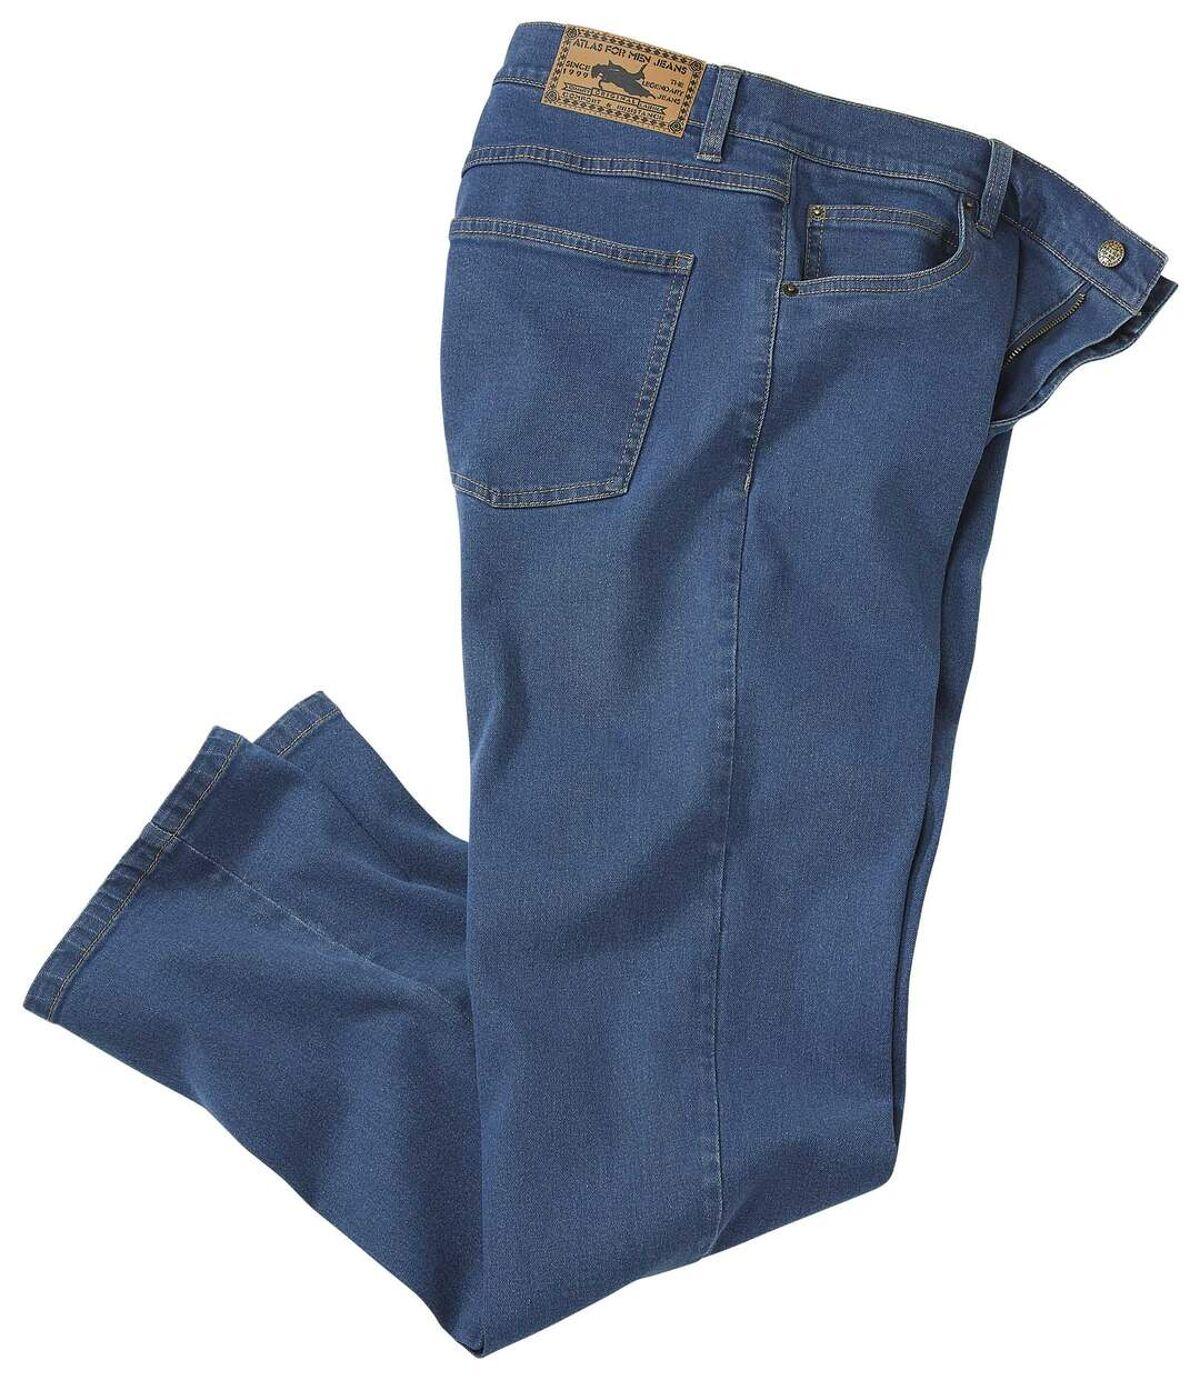 Modré strečové džínsy rovného střihu Regular Atlas For Men